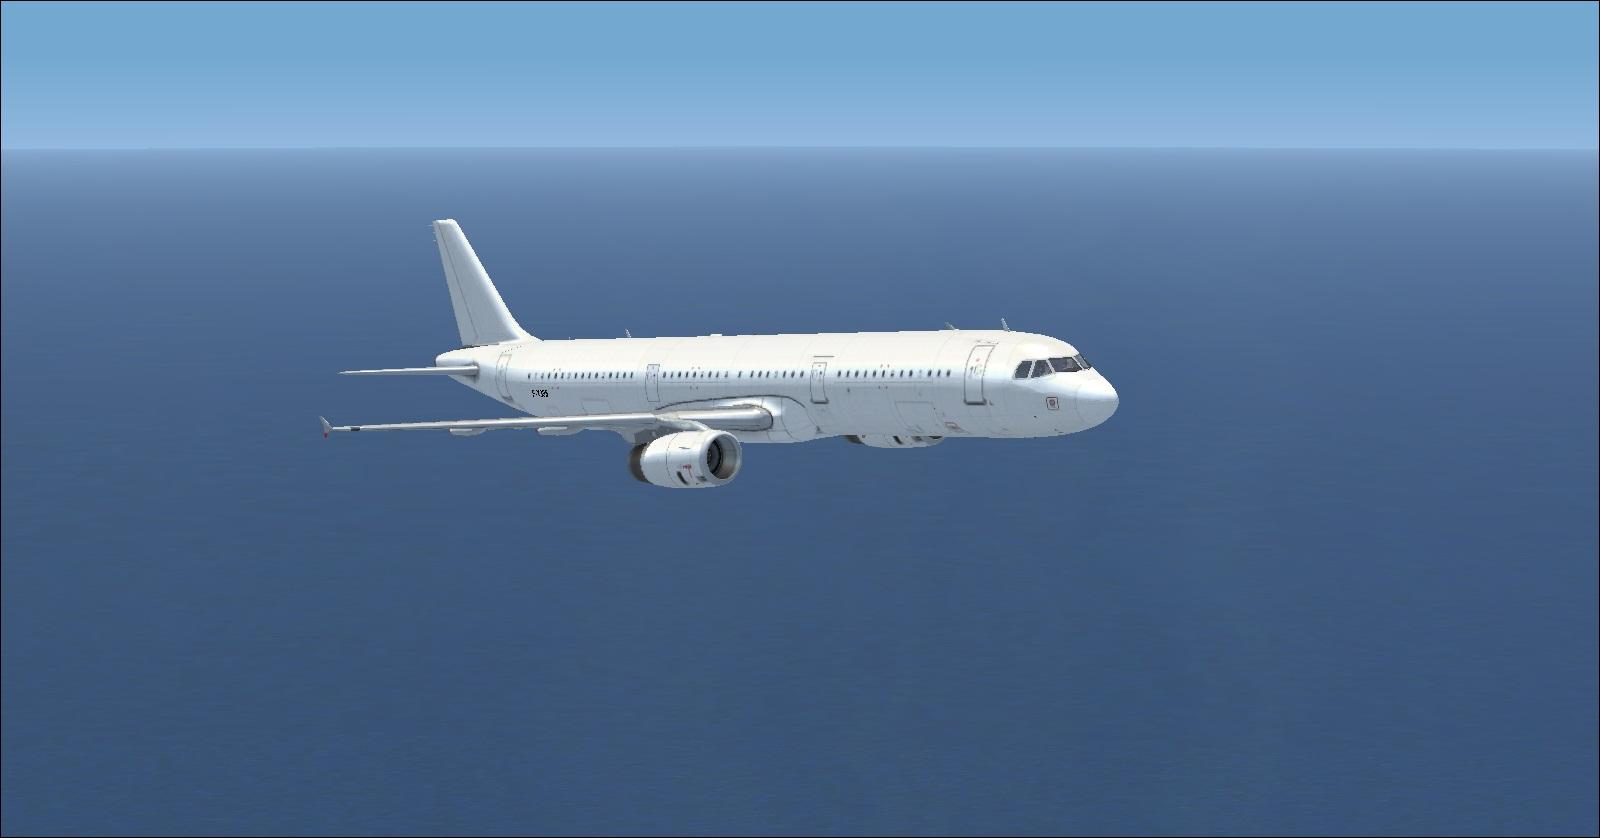 Airbus A321 | Microsoft Flight Simulator X Wiki | FANDOM powered by